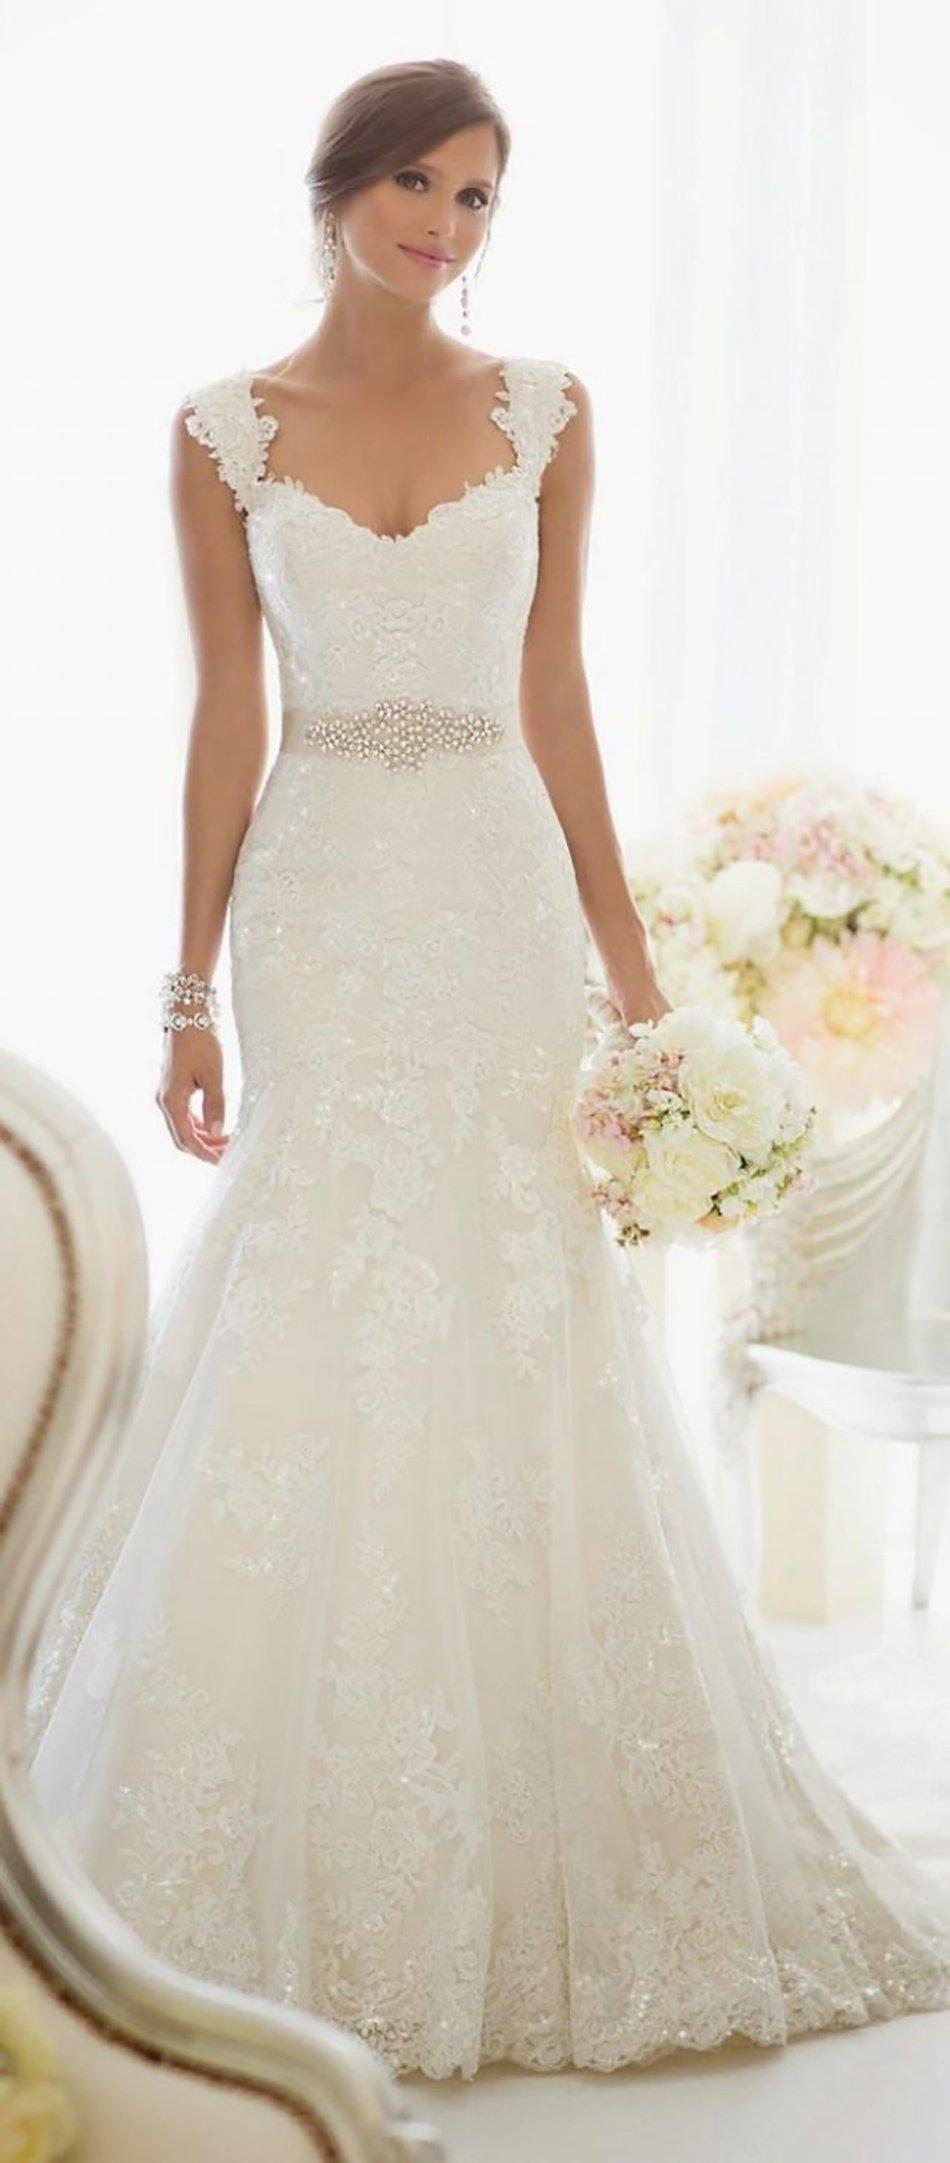 One Wedding Dress Try Three